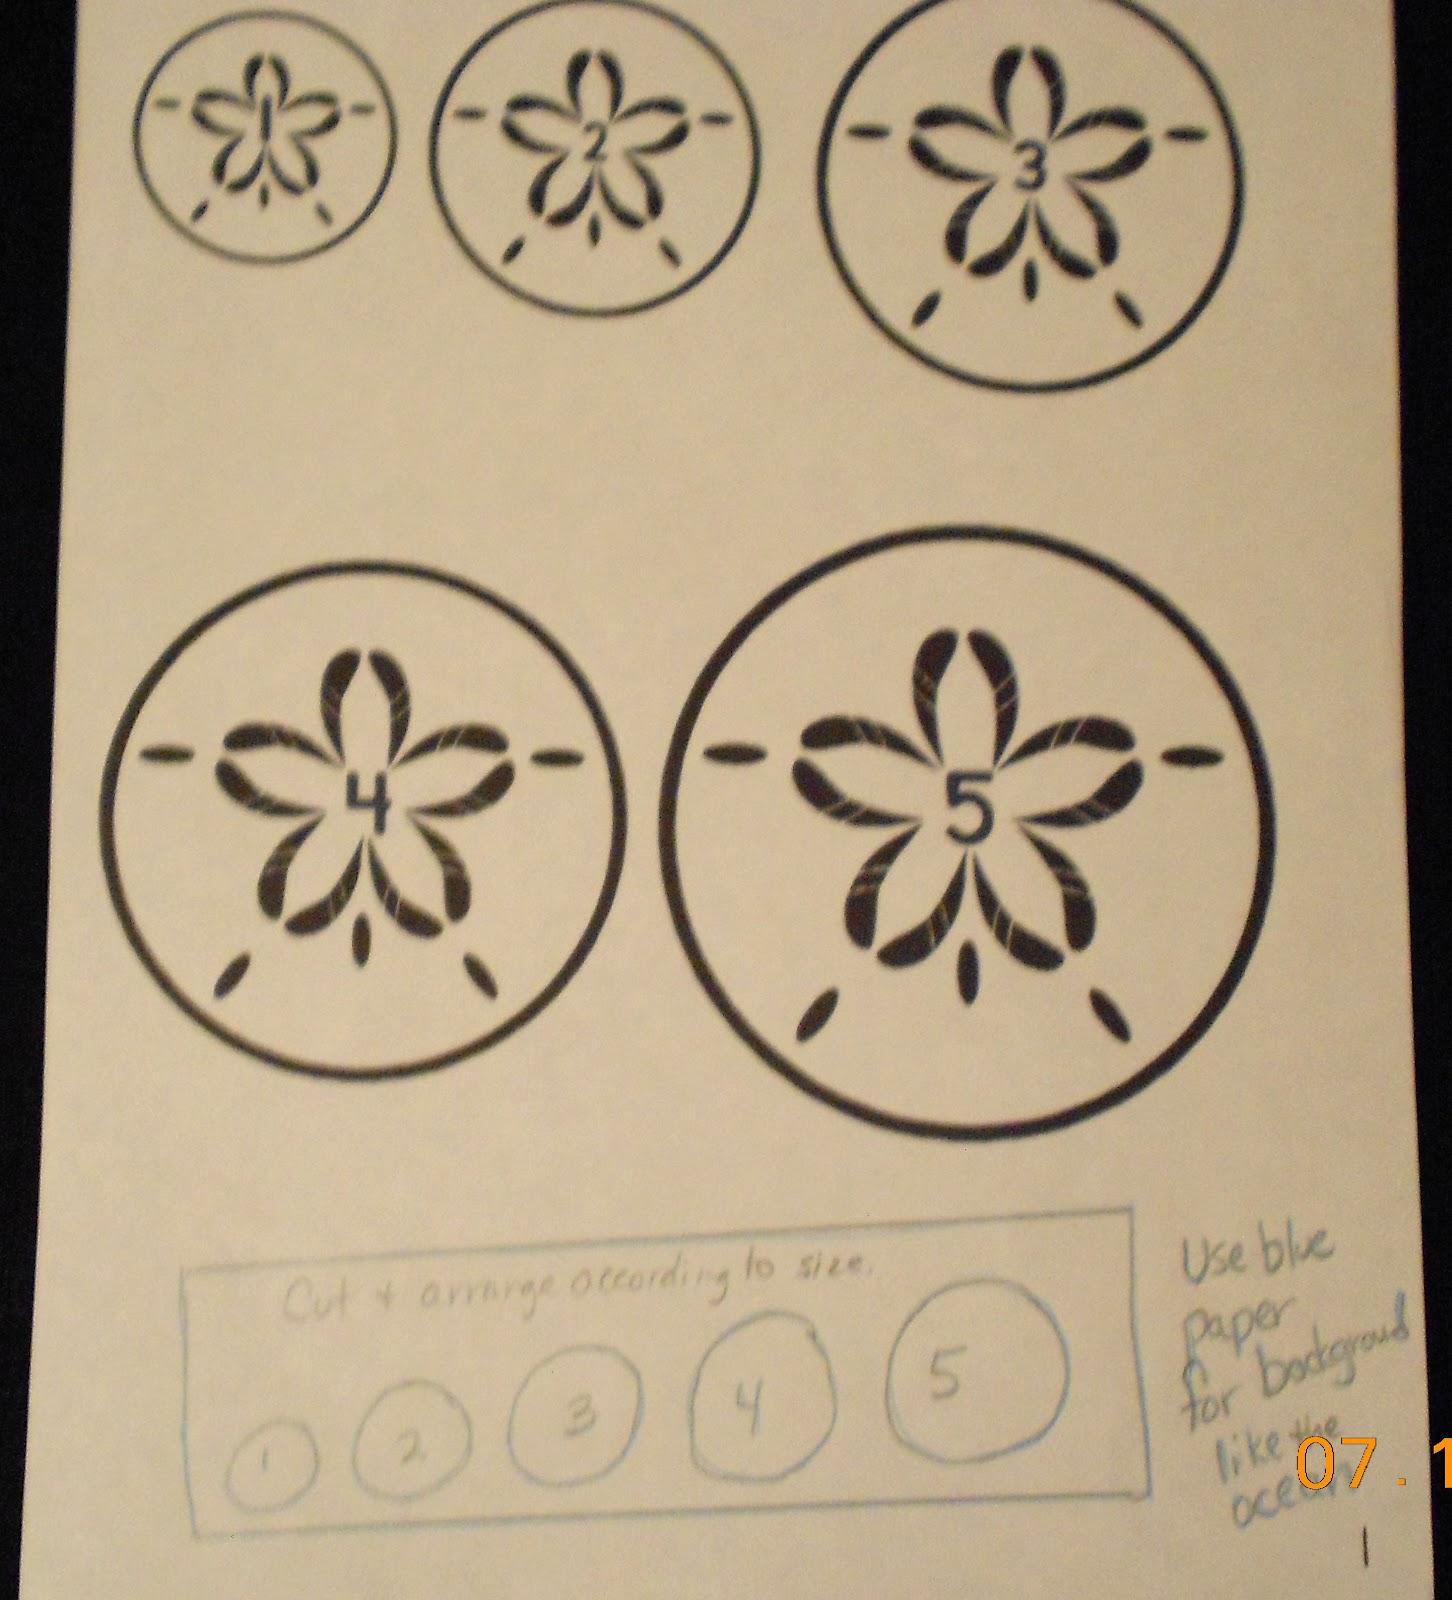 Sand Dollar Tattoo Outline | www.topsimages.com